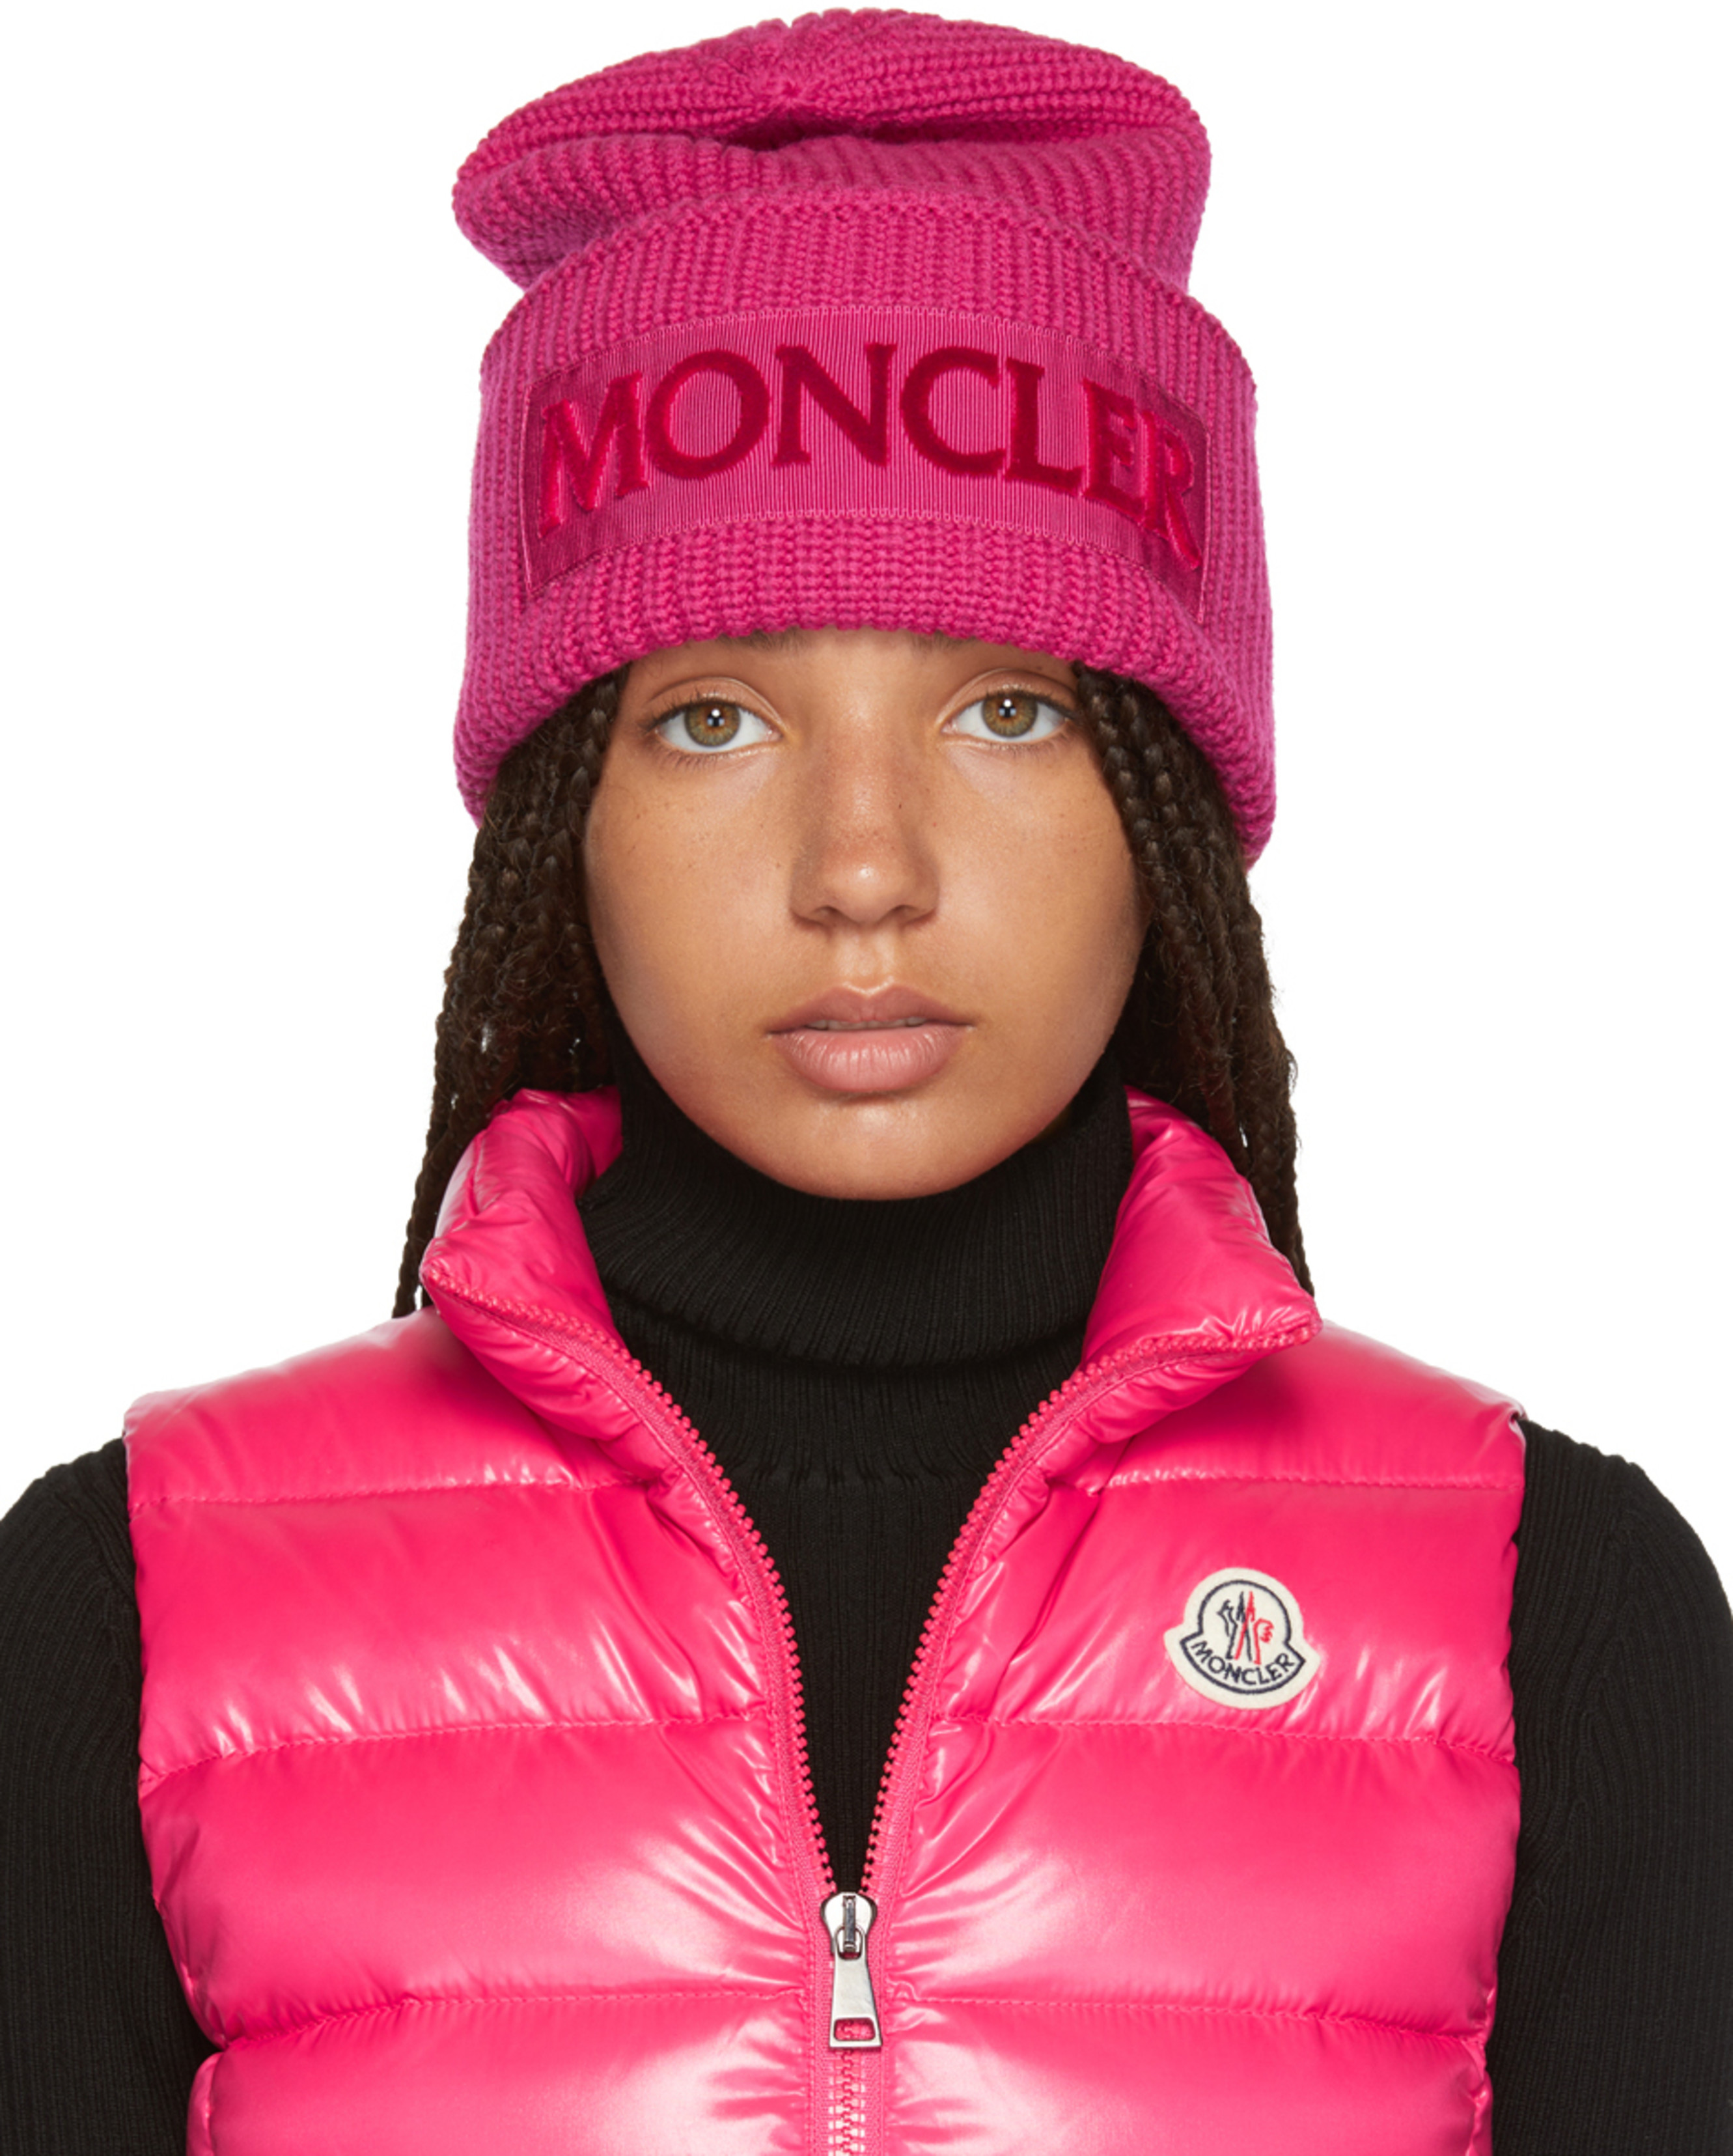 59c6e662b0655 Moncler hats for Women